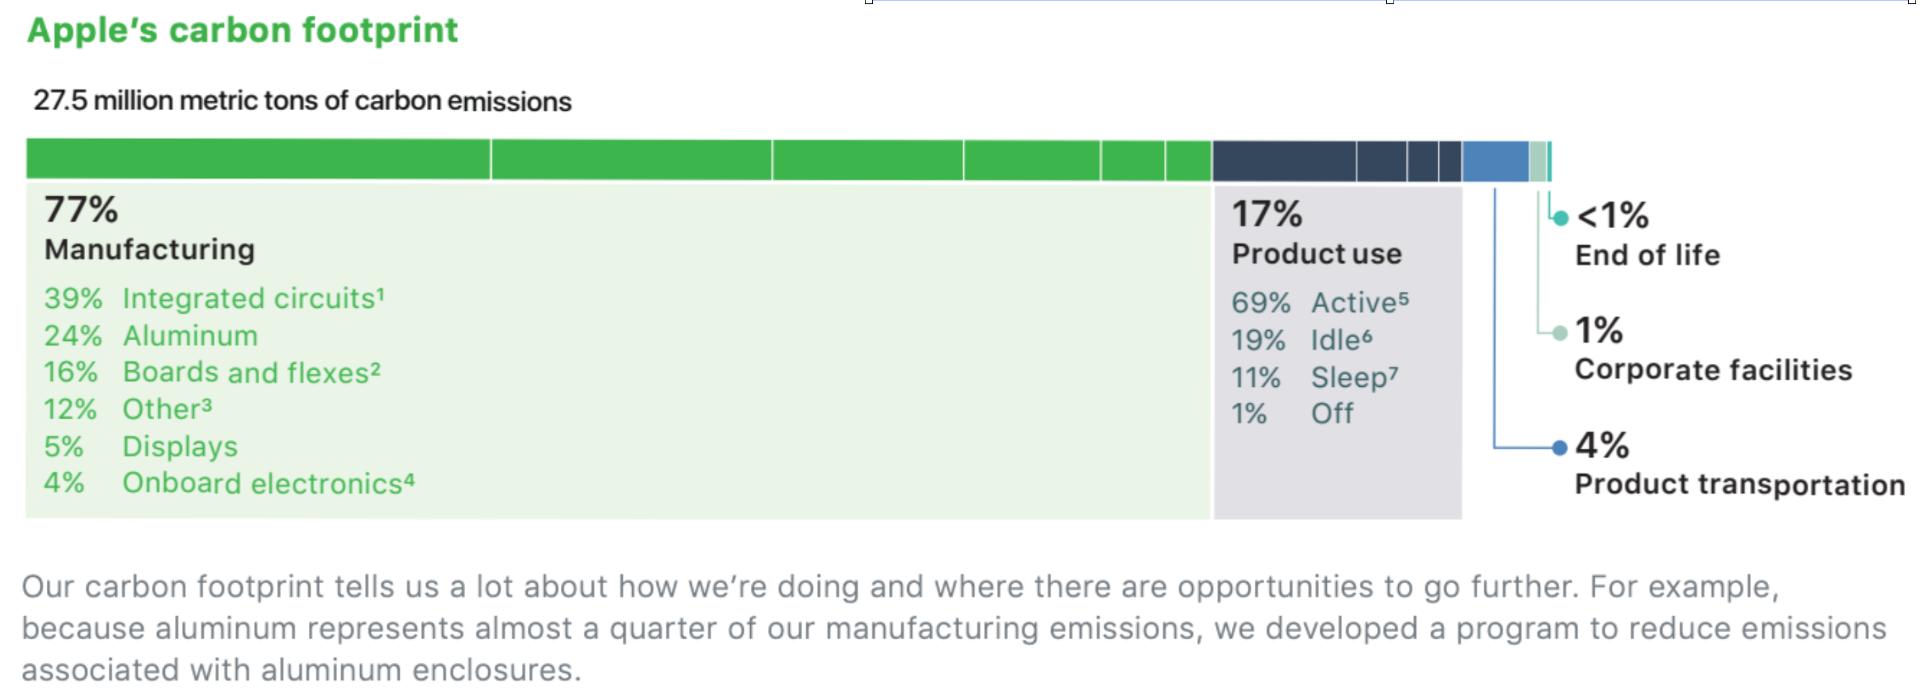 Environmental Management Accounting EMA monetary physical units MEMA PEMA carbon emissions reductions